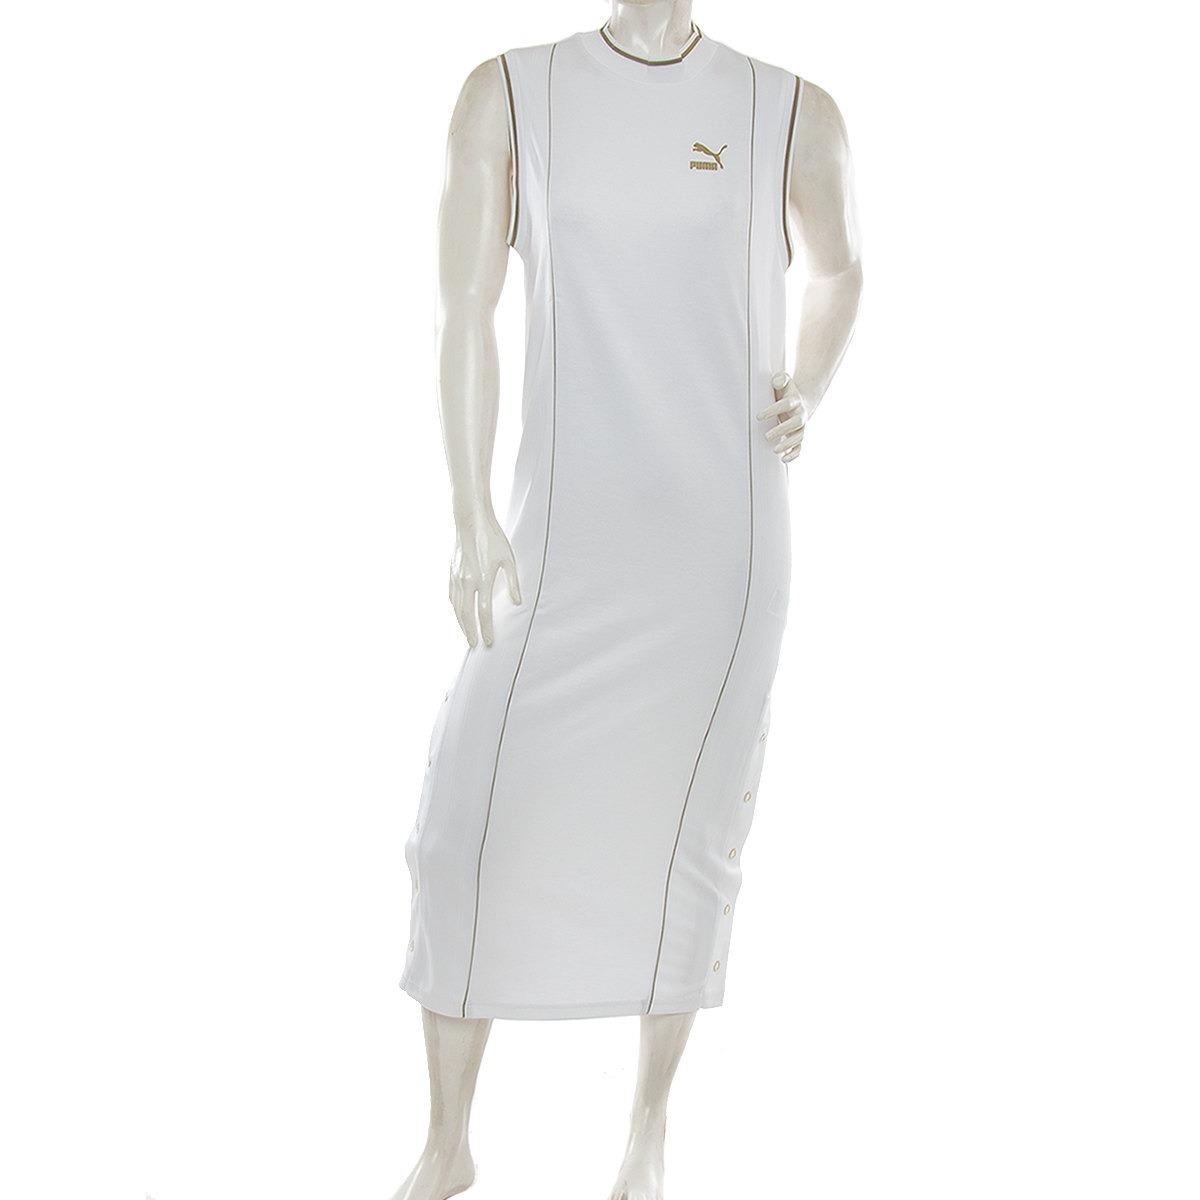 aa38e8e424 vestido retro blanco puma blast tienda oficial. Cargando zoom.